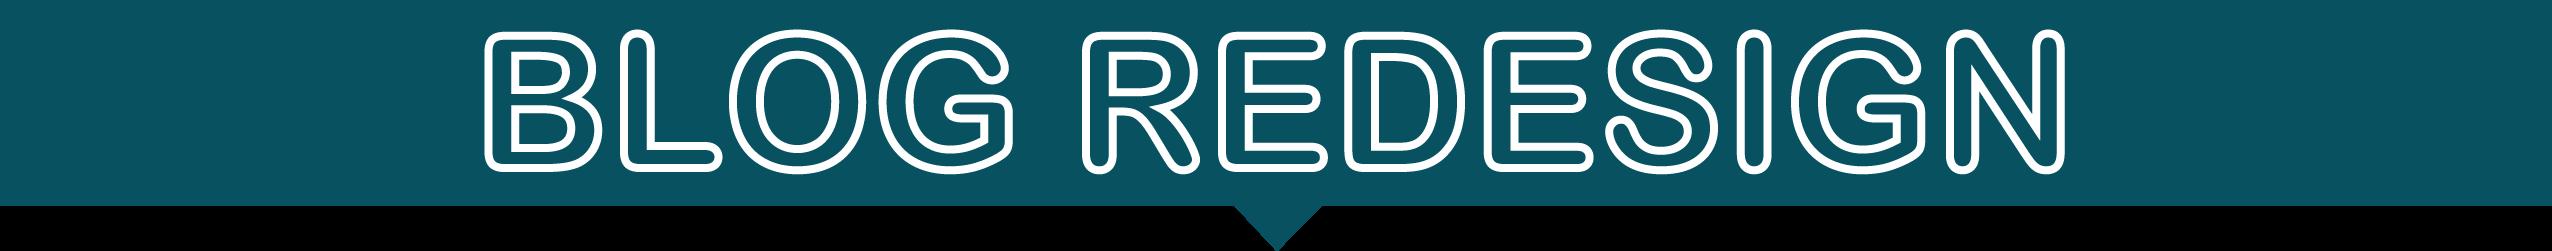 Blog Redesign